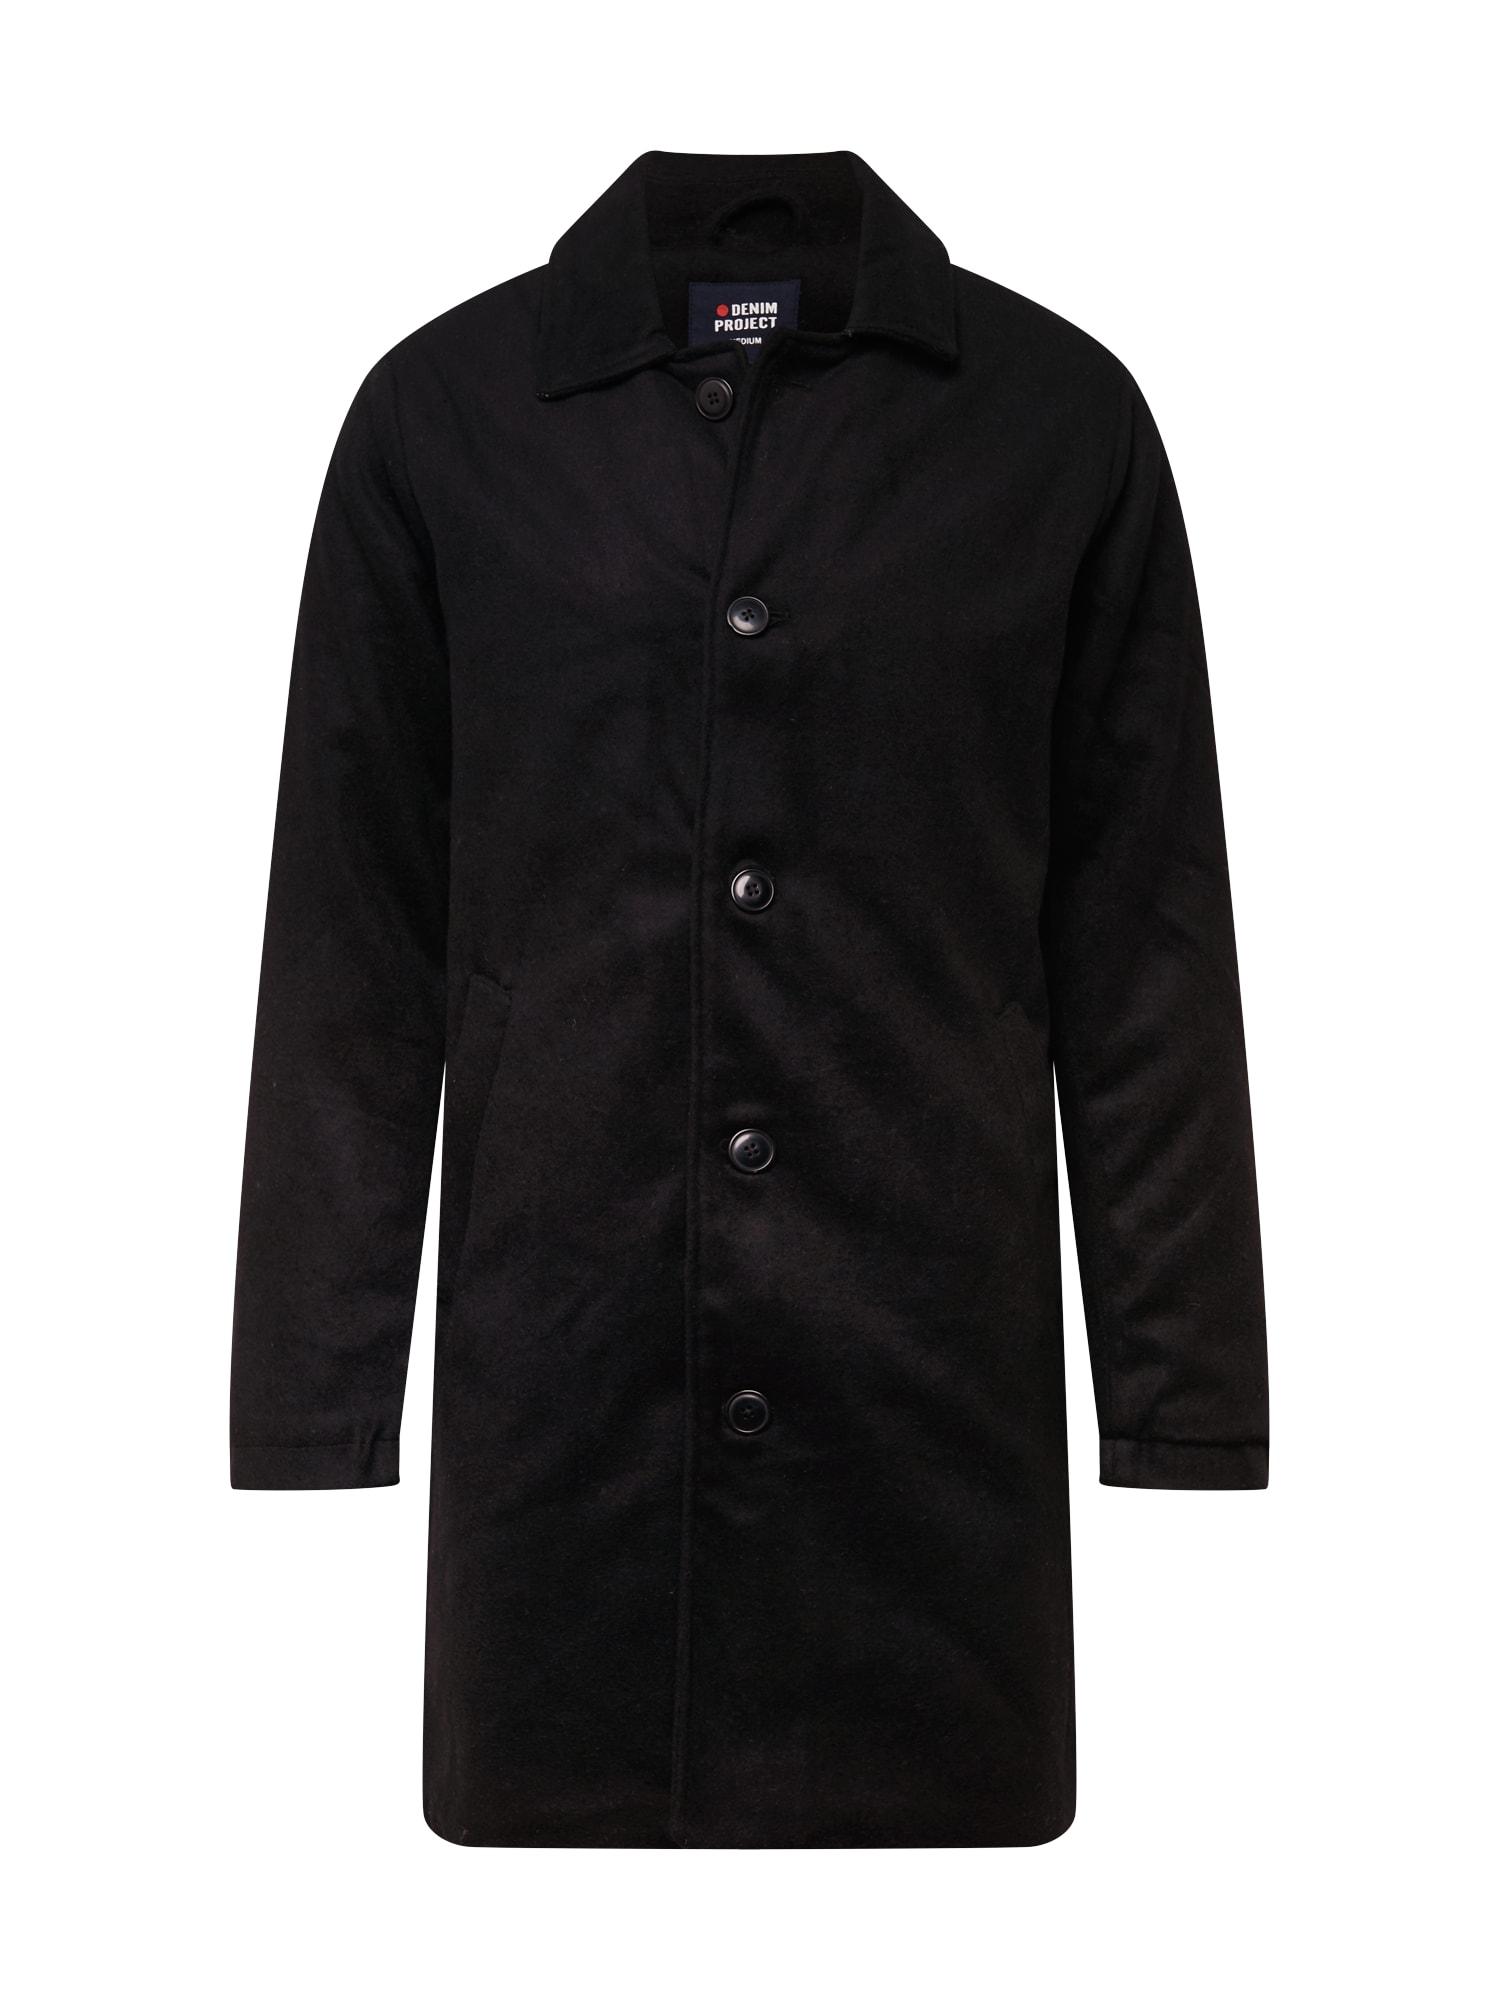 Denim Project Demisezoninis paltas juoda